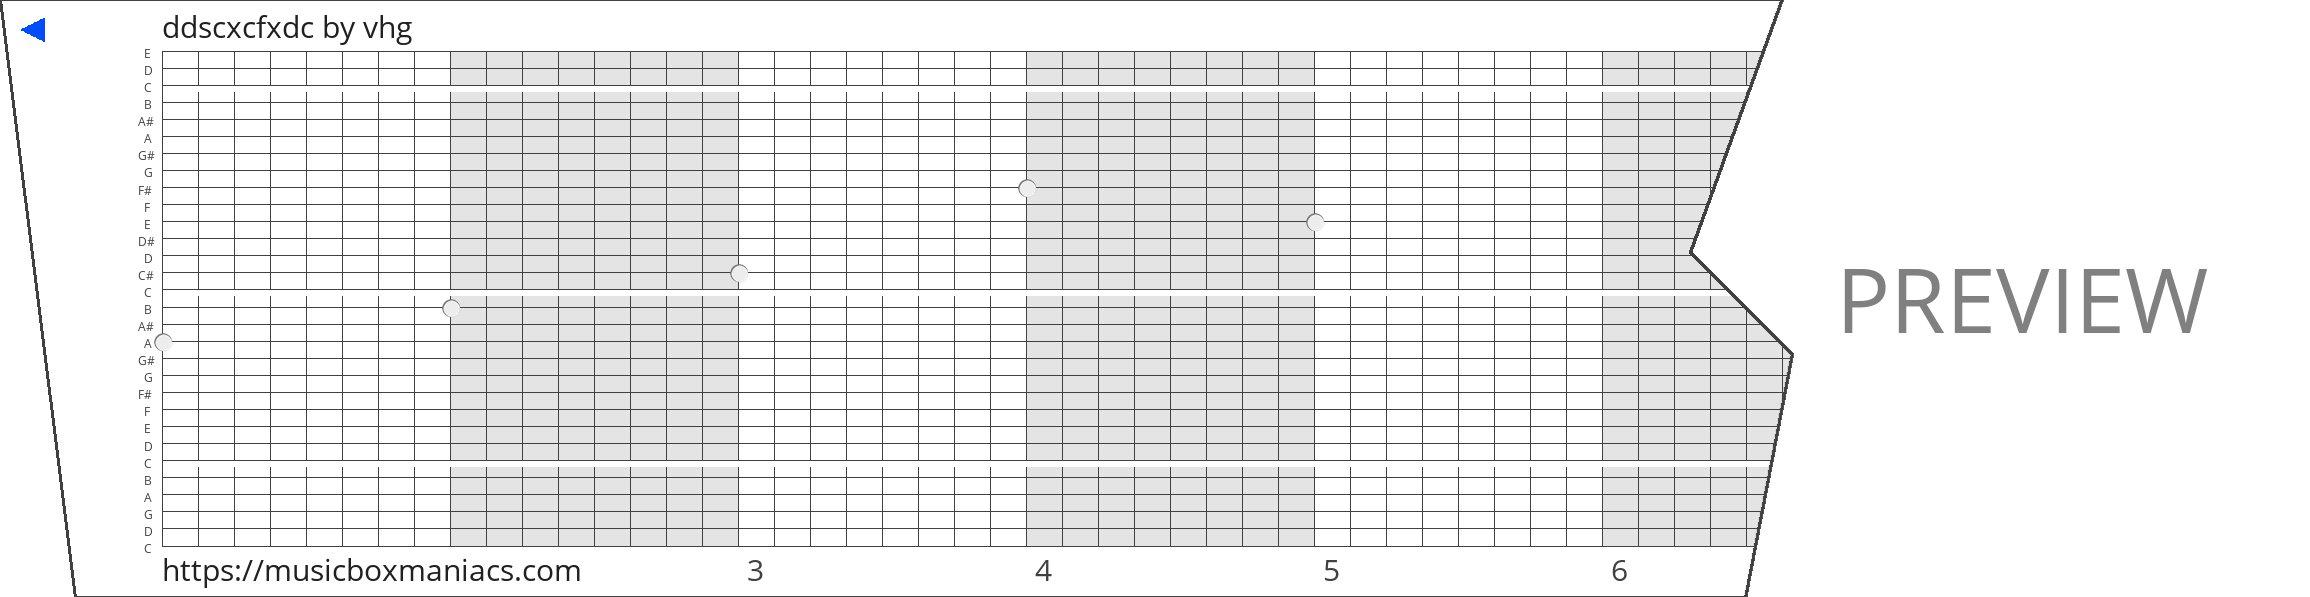 ddscxcfxdc 30 note music box paper strip